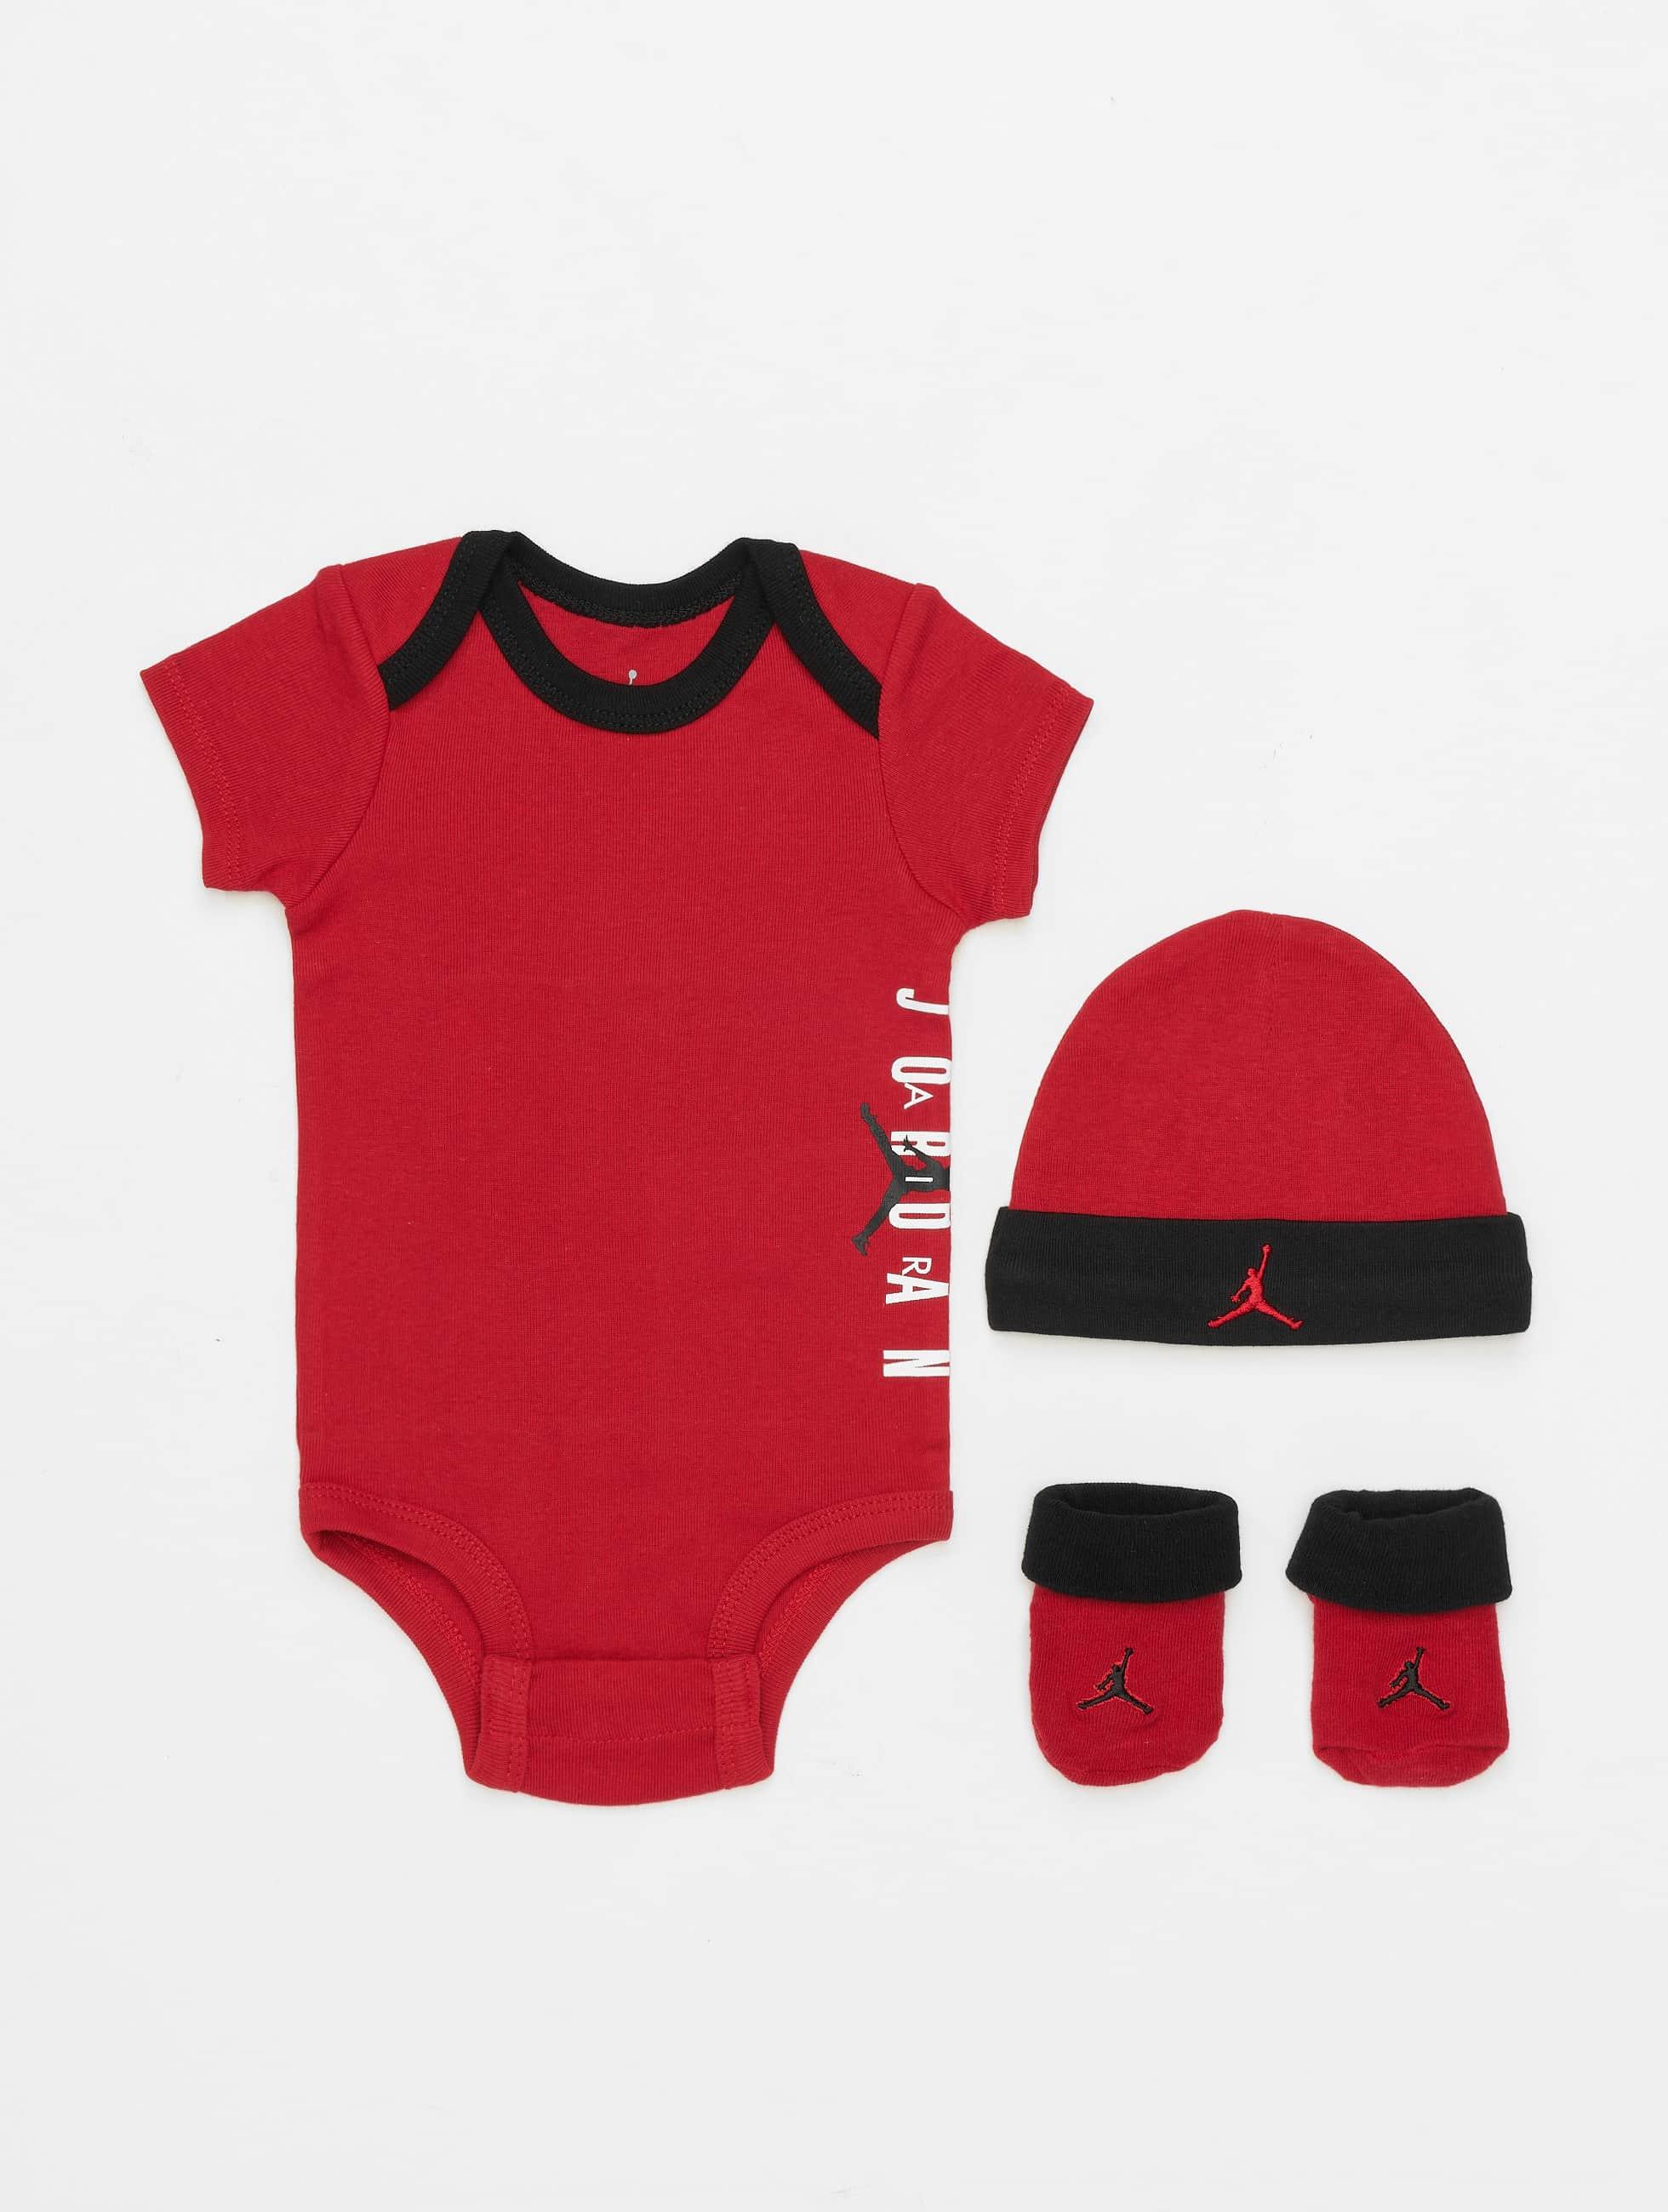 Jordan | Air 3 PC Box  rouge Enfant Body